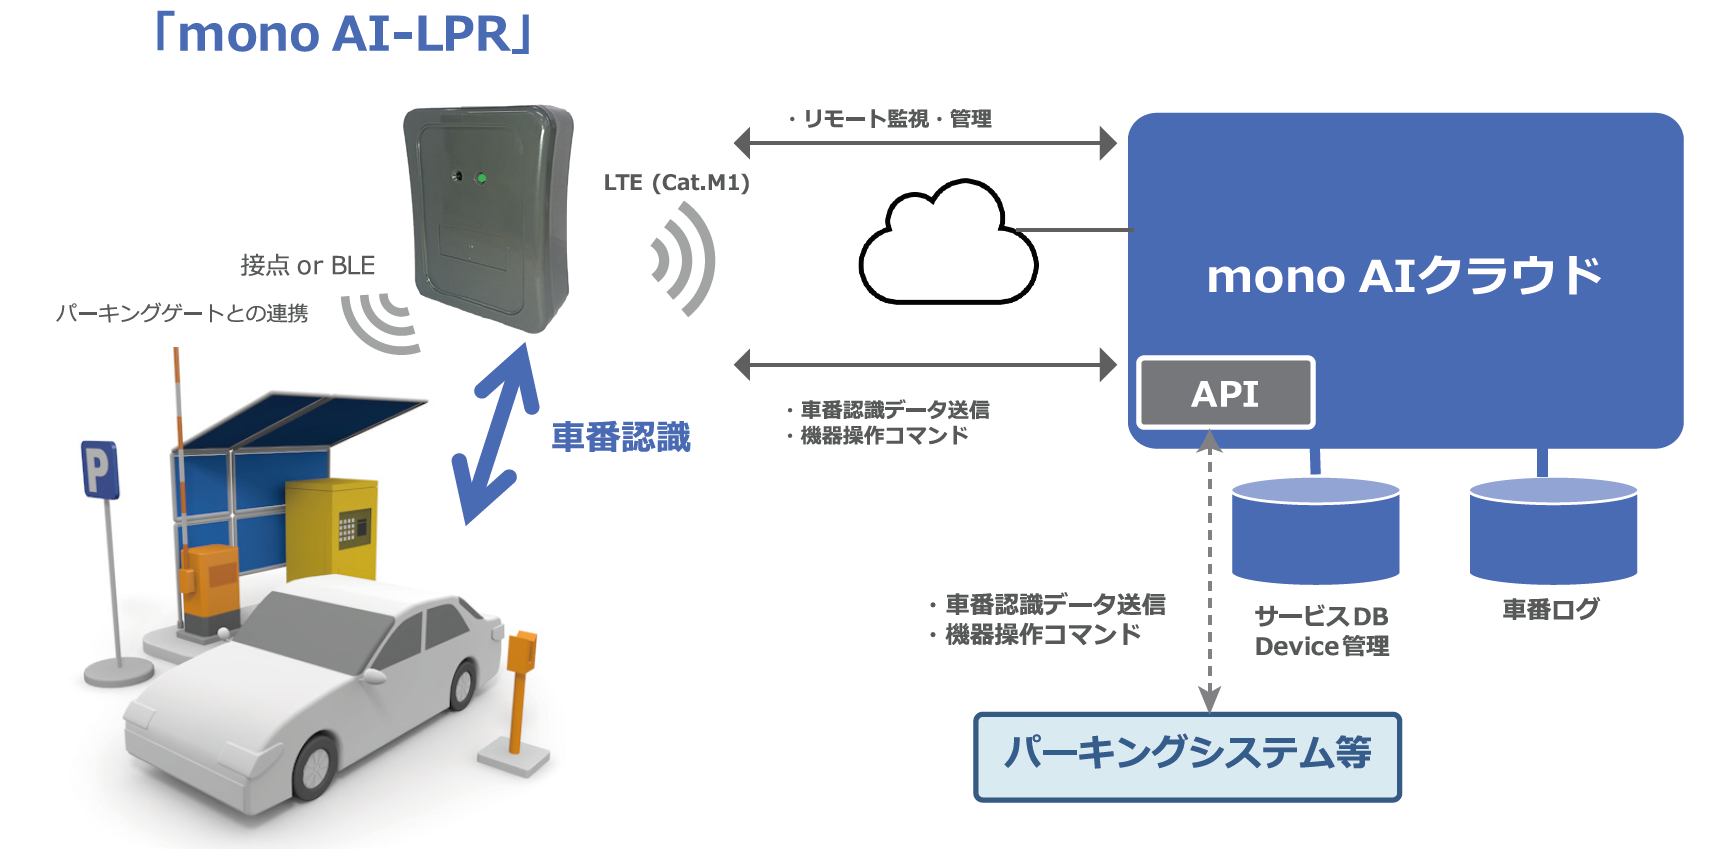 mono AI-LPR